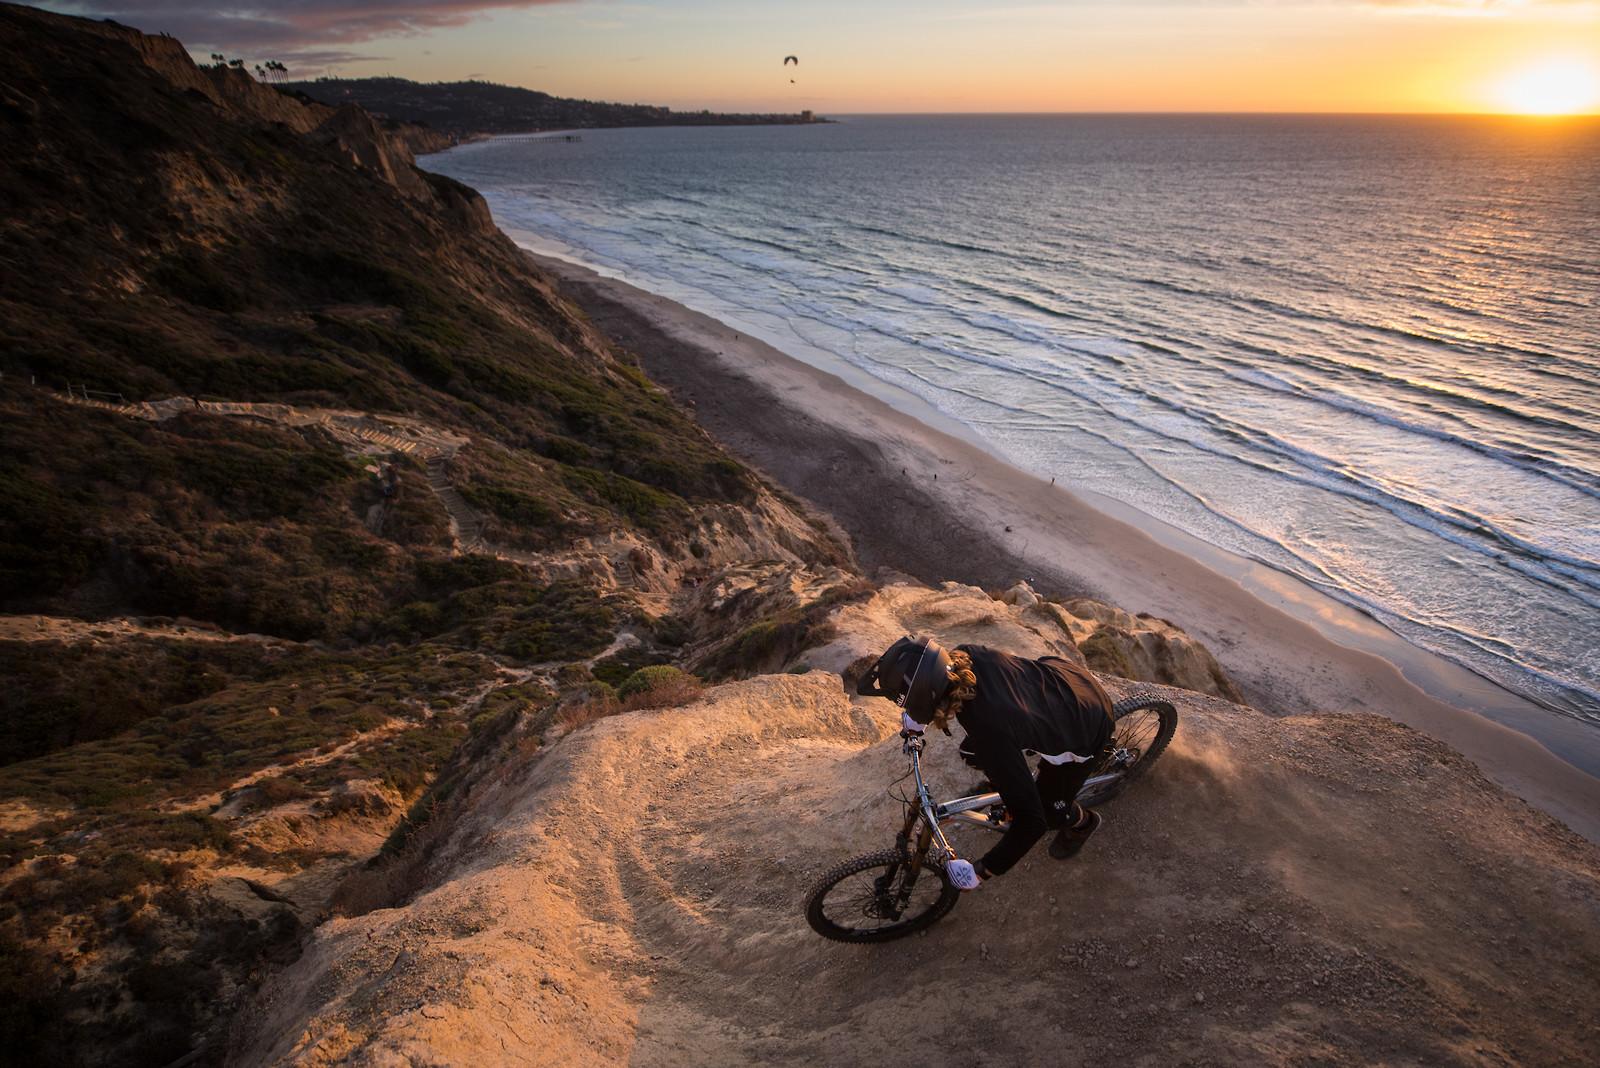 Luca Cometti / SoCal - NicoBrizin - Mountain Biking Pictures - Vital MTB